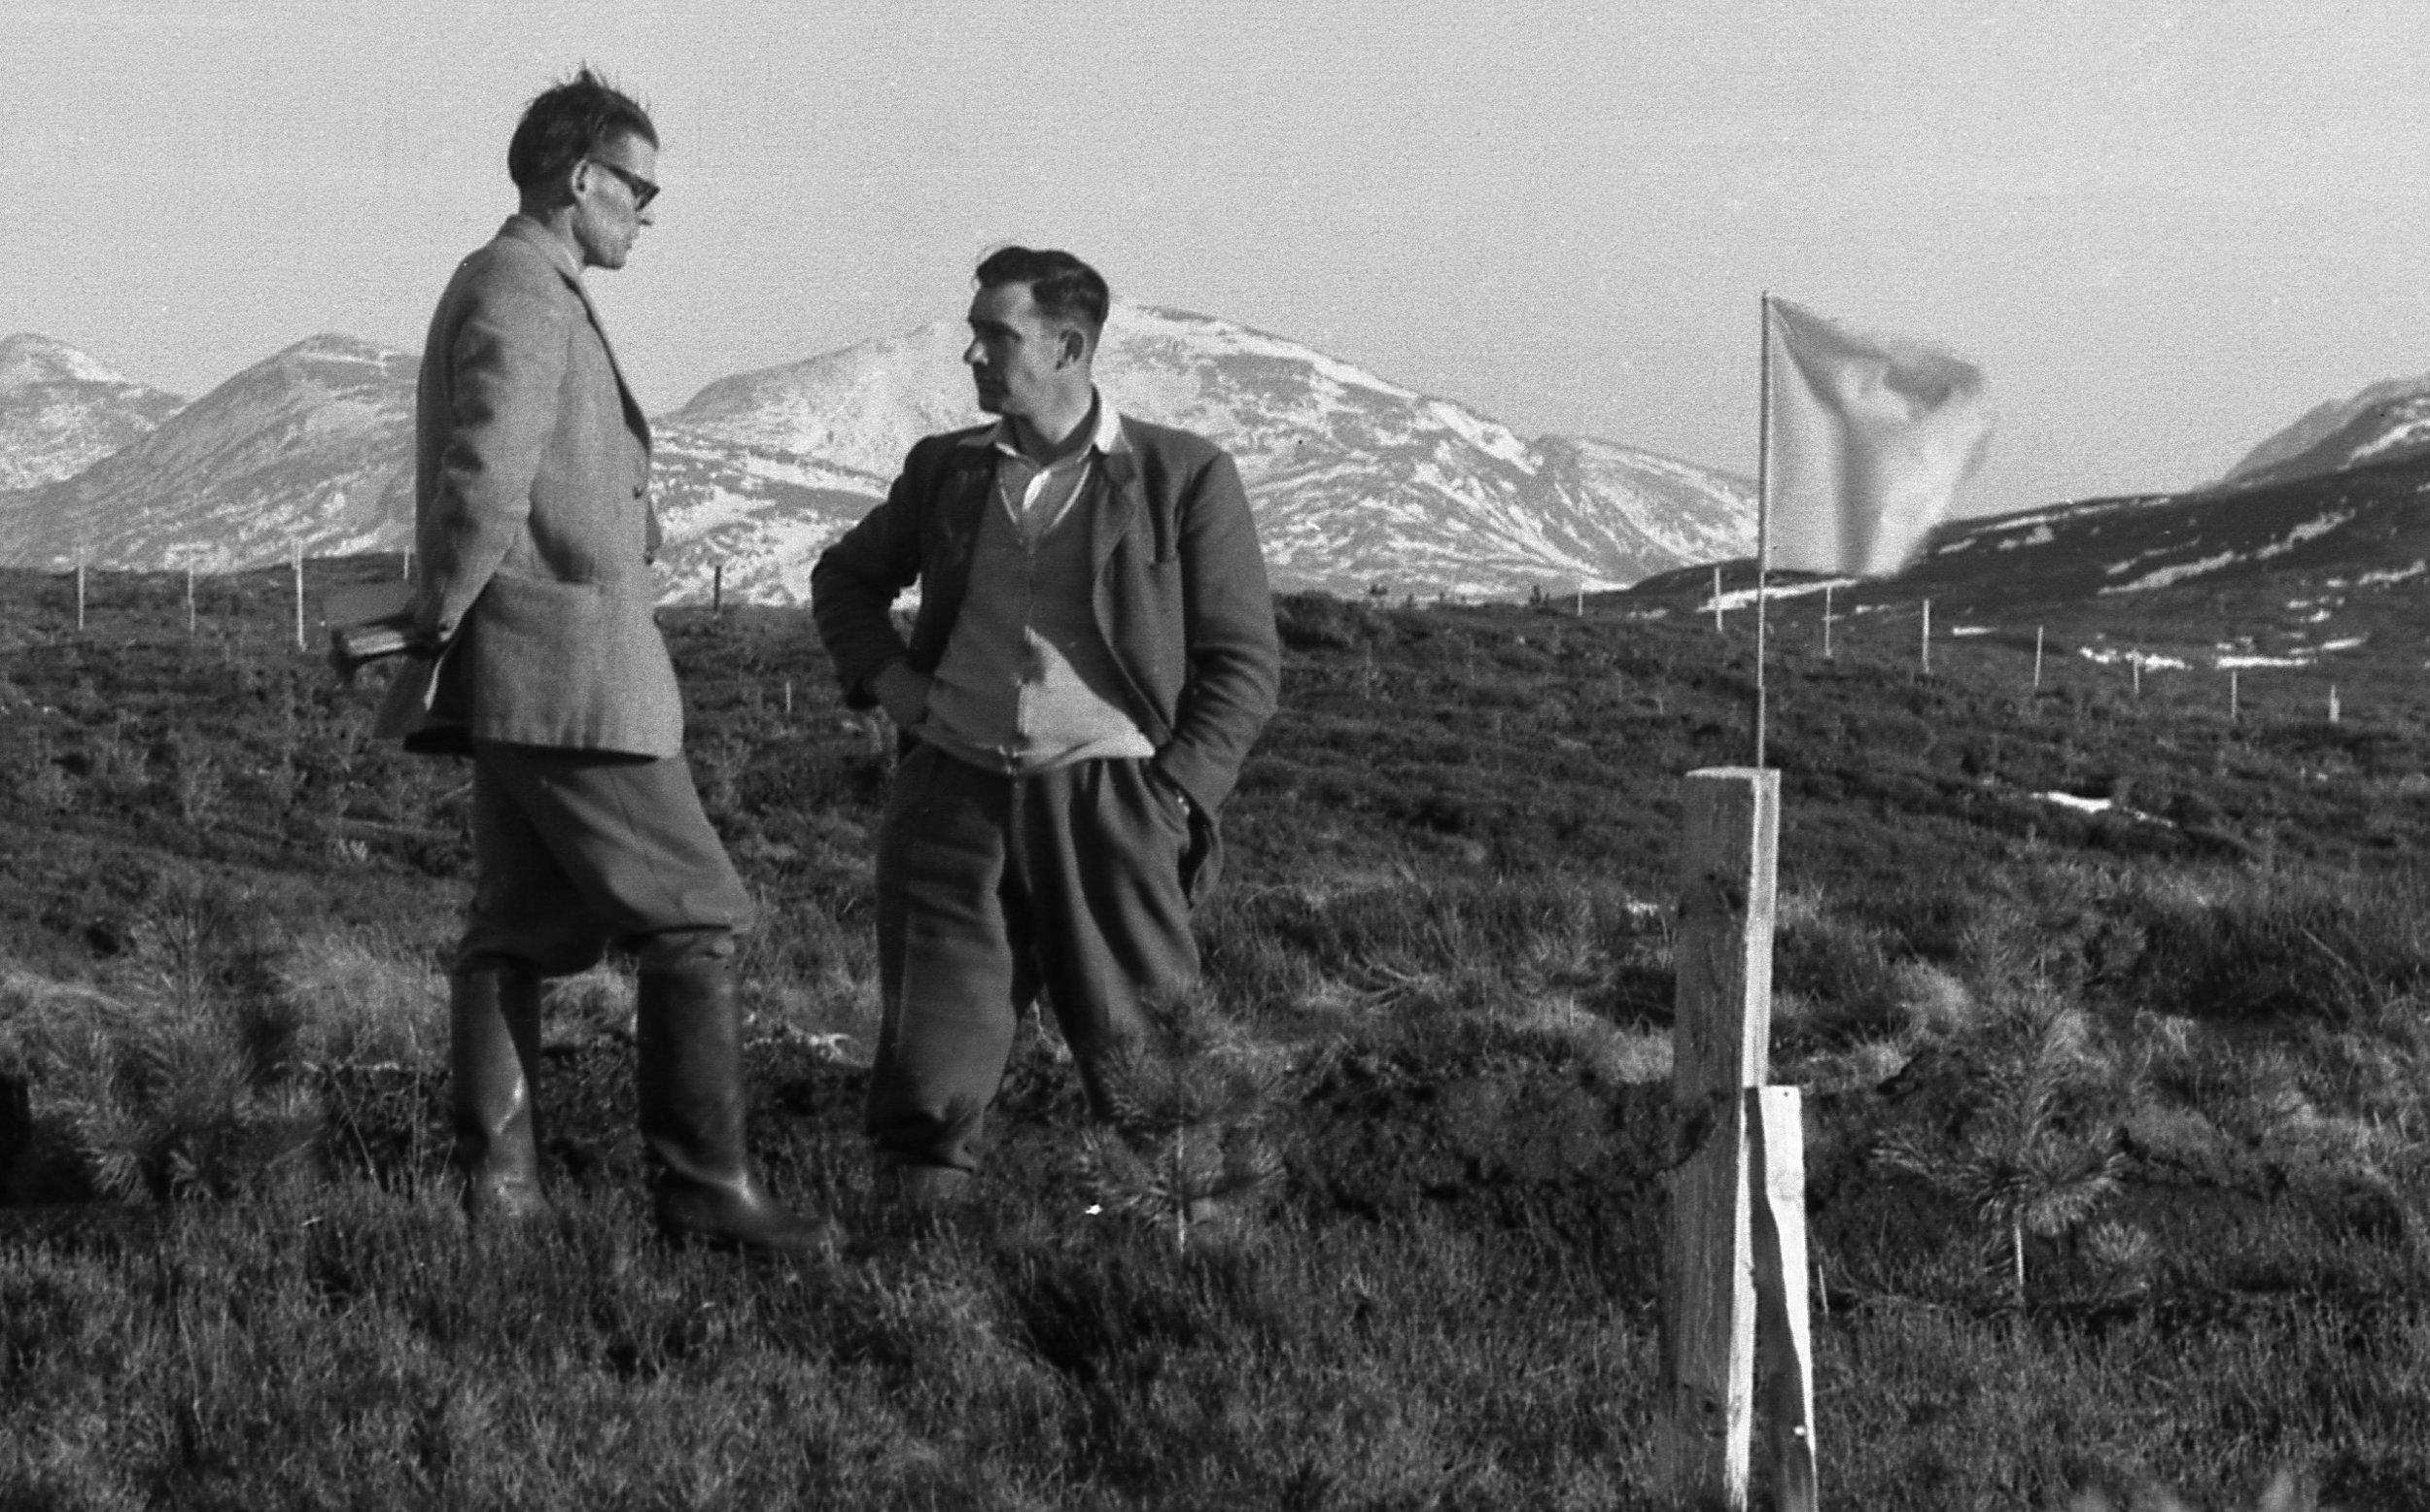 Surveying new lands, 1927